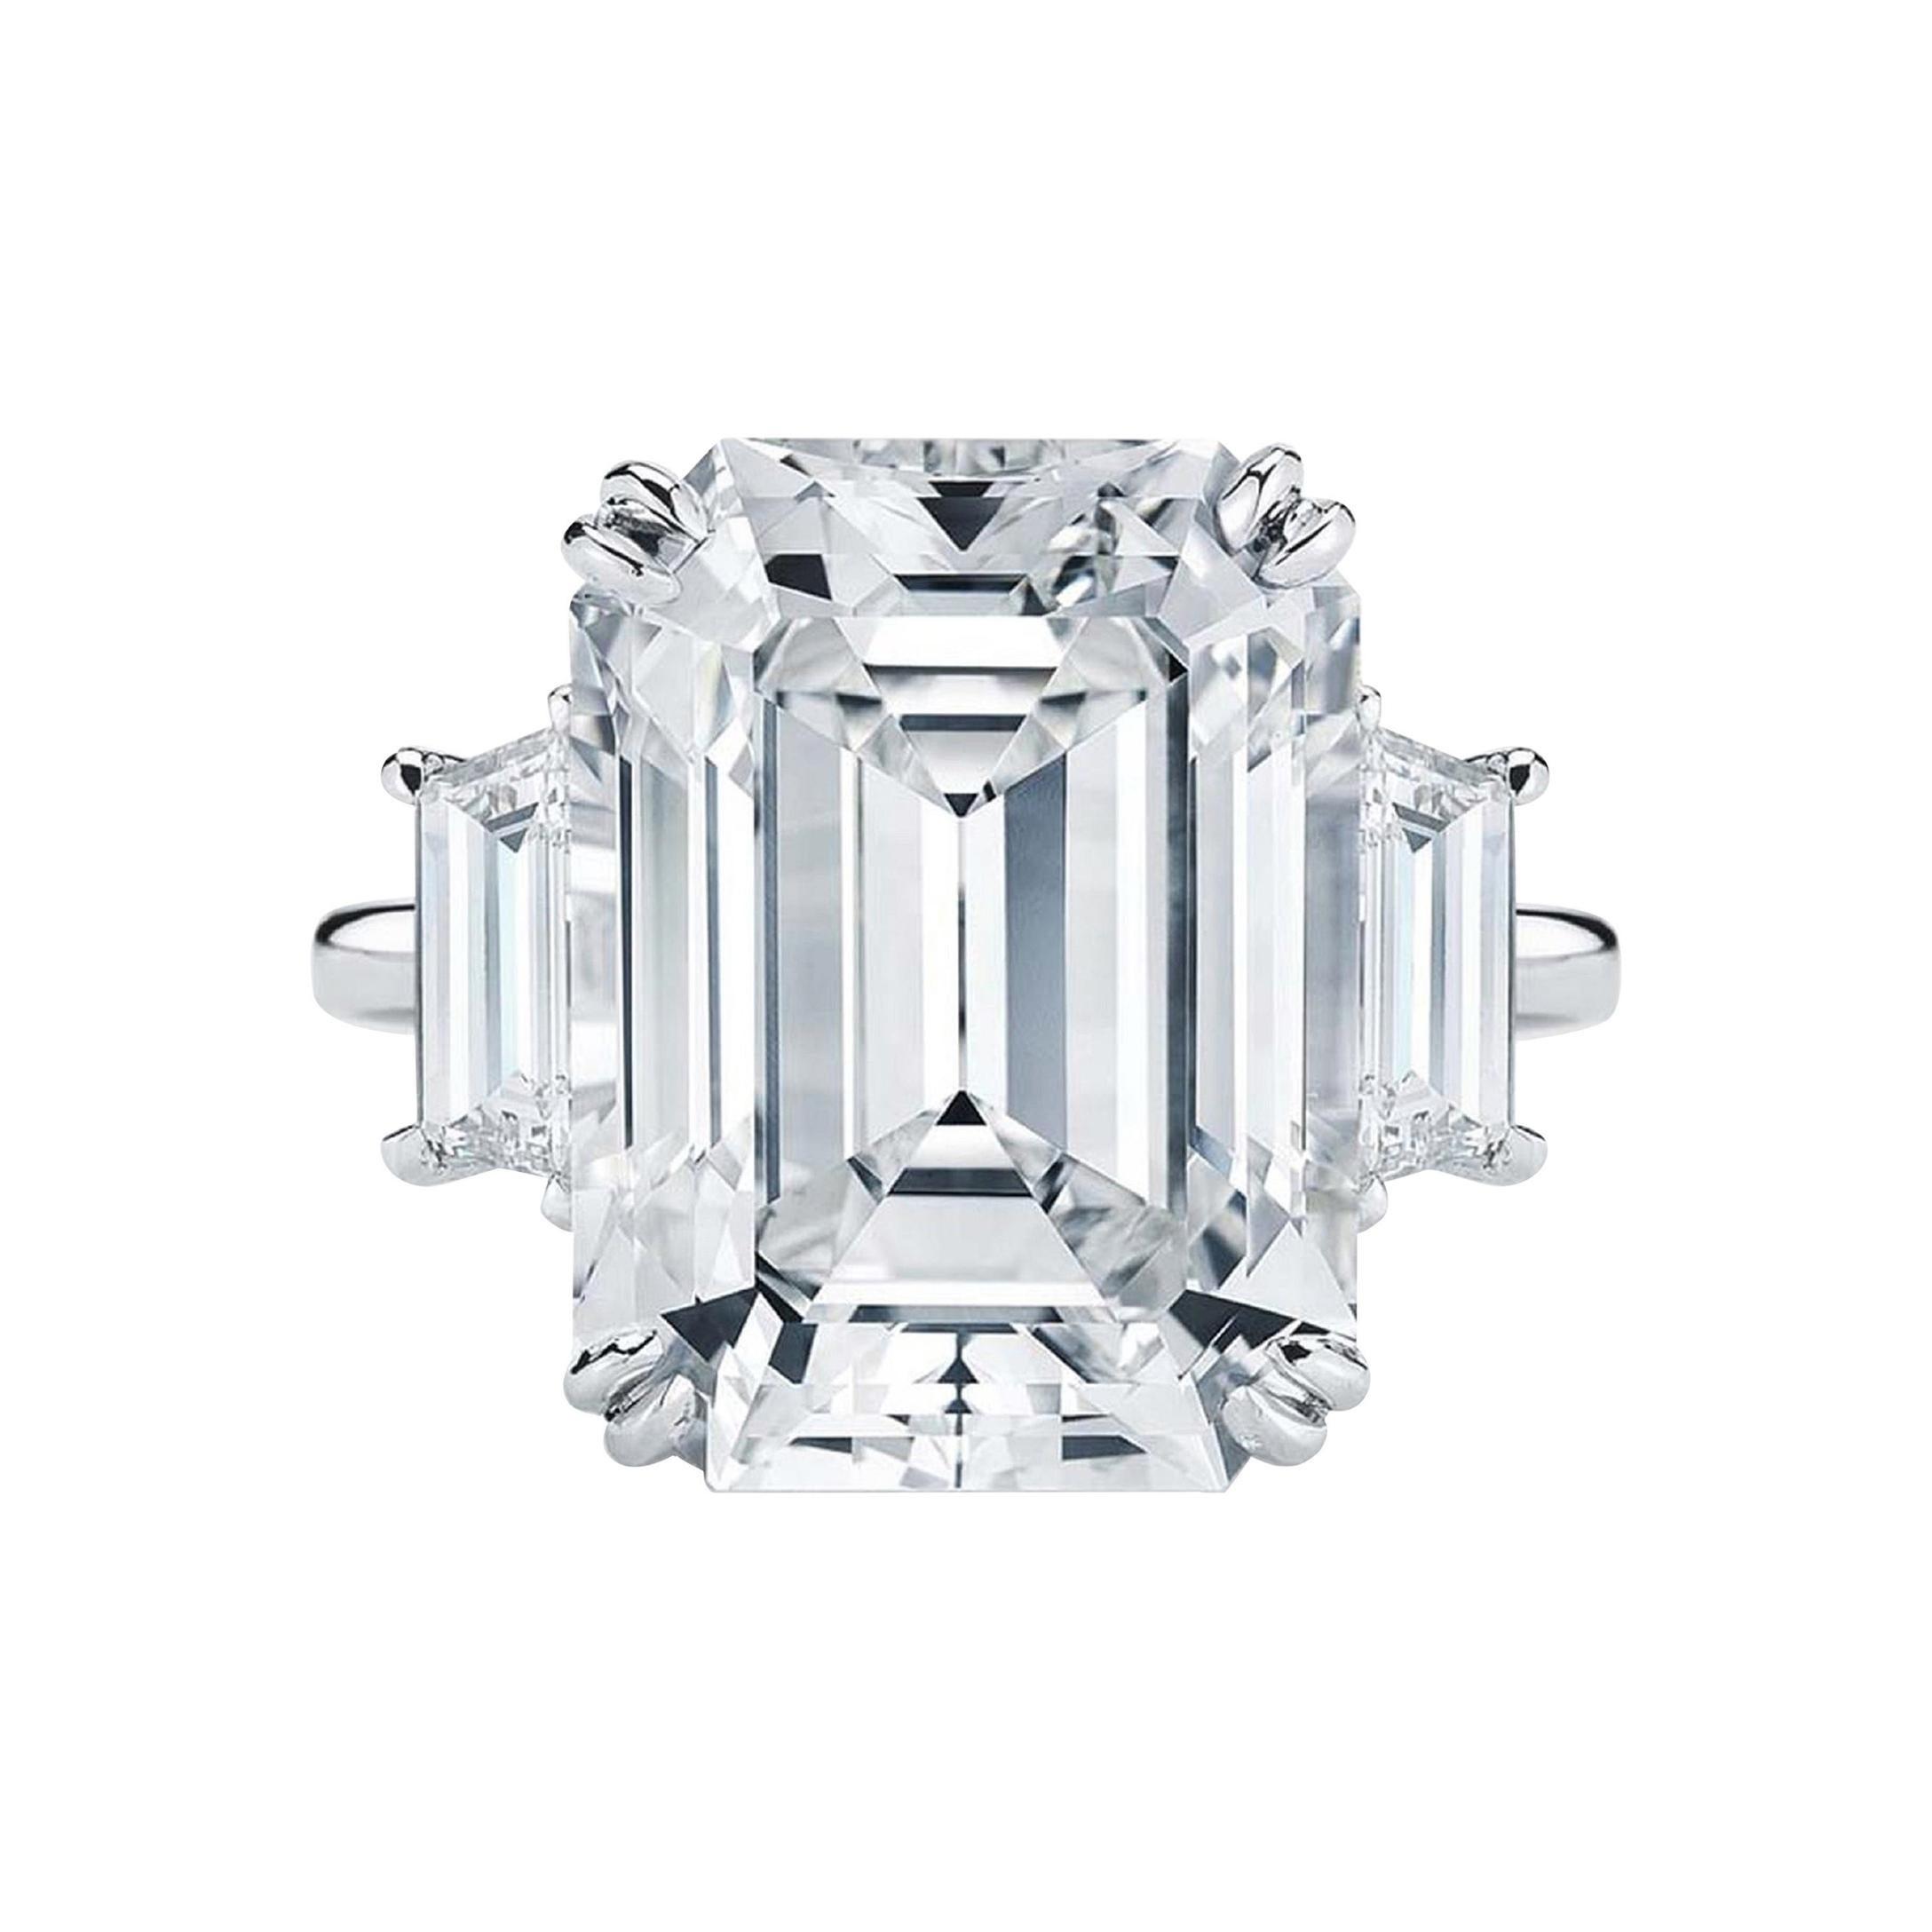 GIA Certified 4.65 Carat Emerald Cut Diamond Platinum Ring